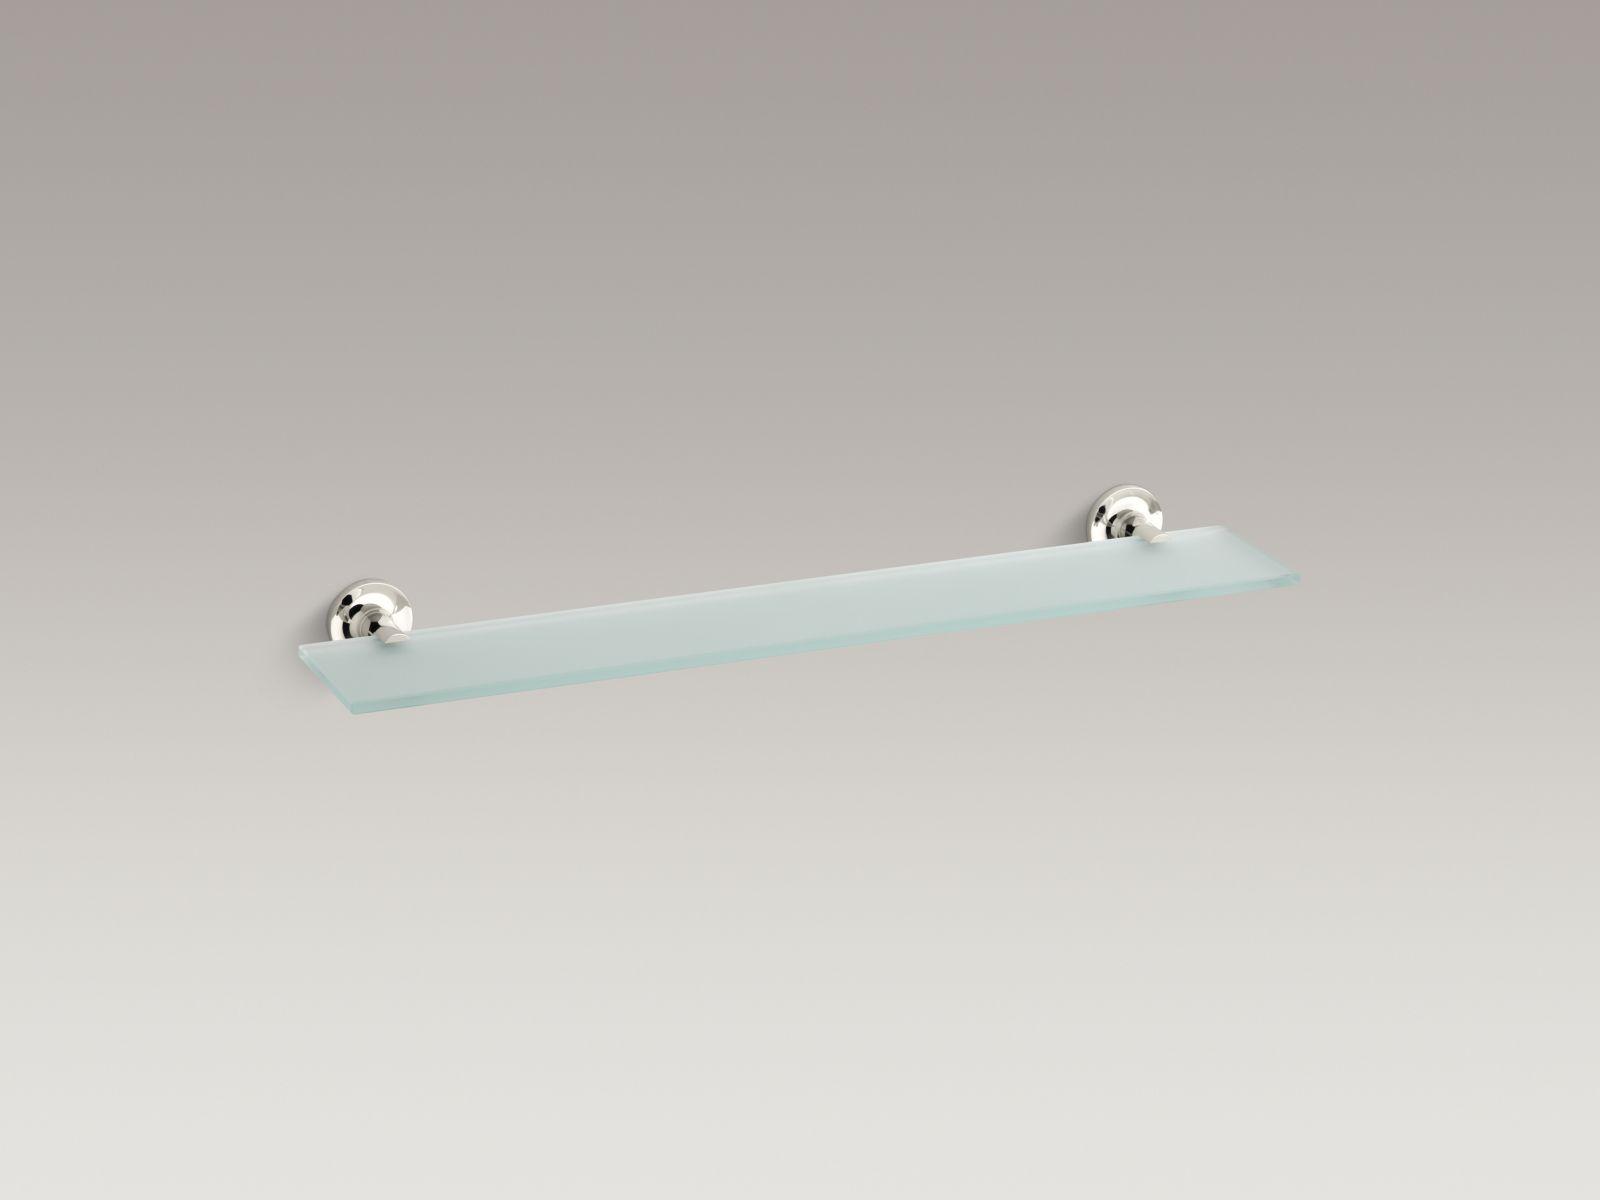 Kohler K-14440-SN Purist Glass Shelf Vibrant Polished Nickel